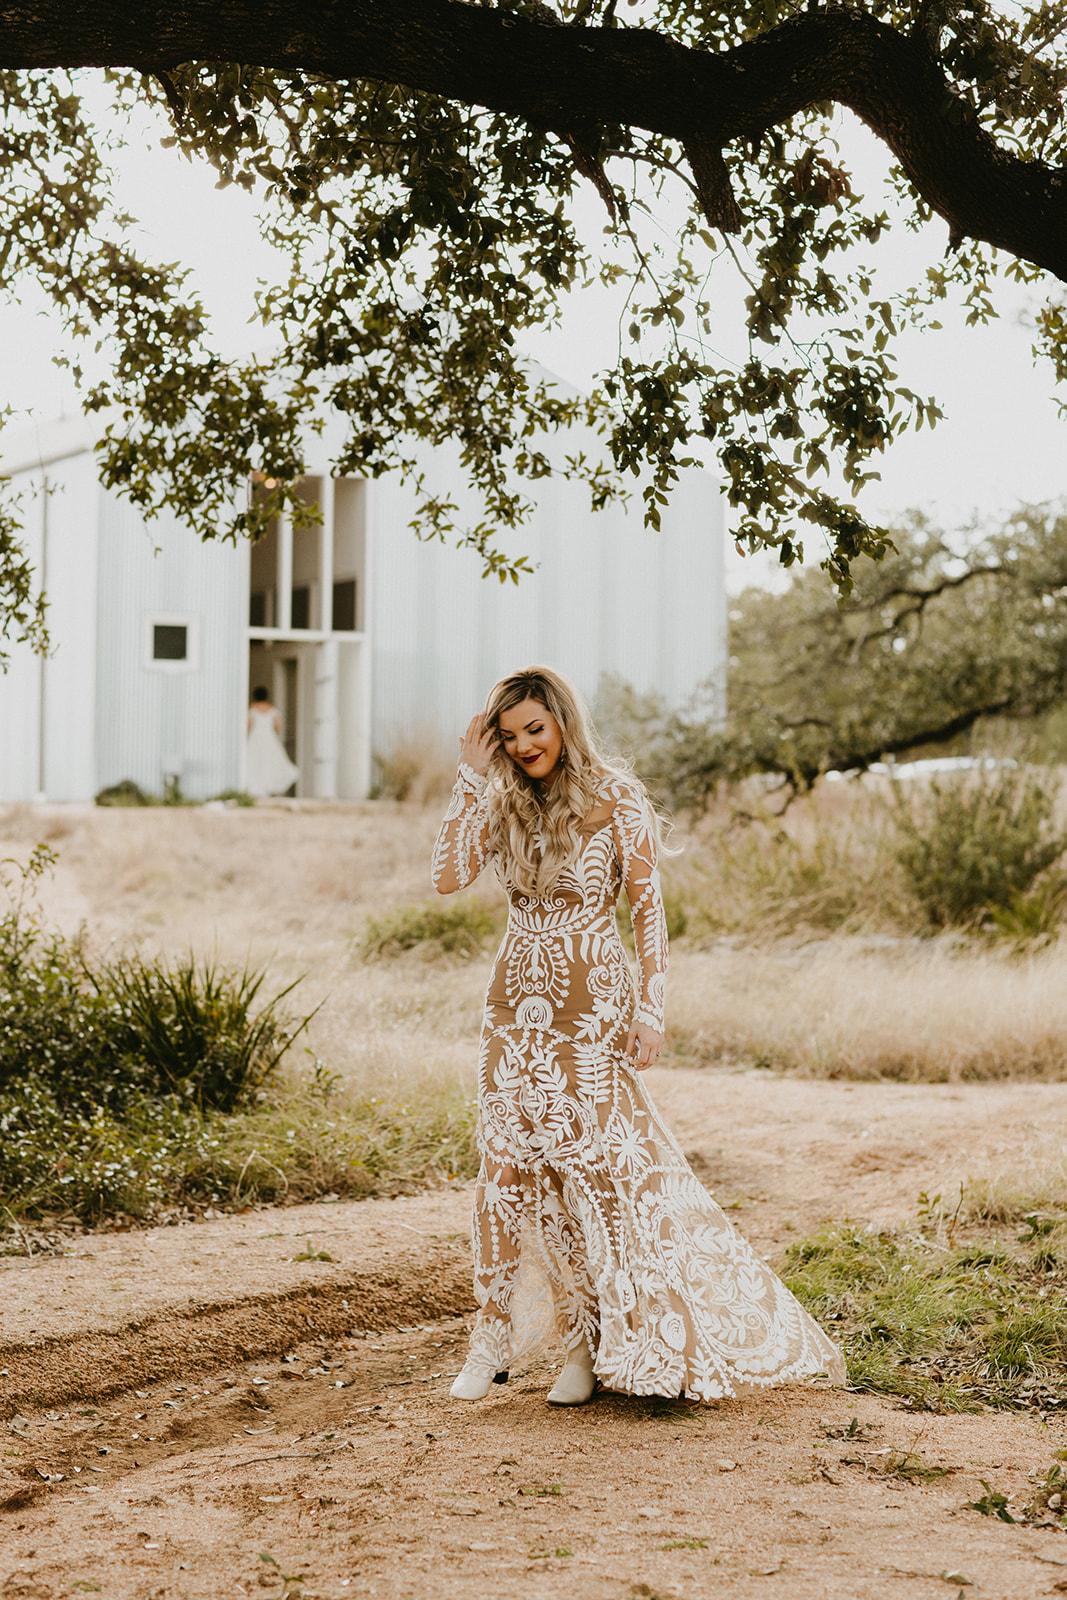 Hawkes_Mr.___Mrs-12.jpg Epoch Co+ | Bride + Groom First Look | Austin Wedding Venue Prospect House | Bridal Dress Rue De Seine + Wedding Dress + Bridal Shoes + Booties  | Austin Wedding Planner